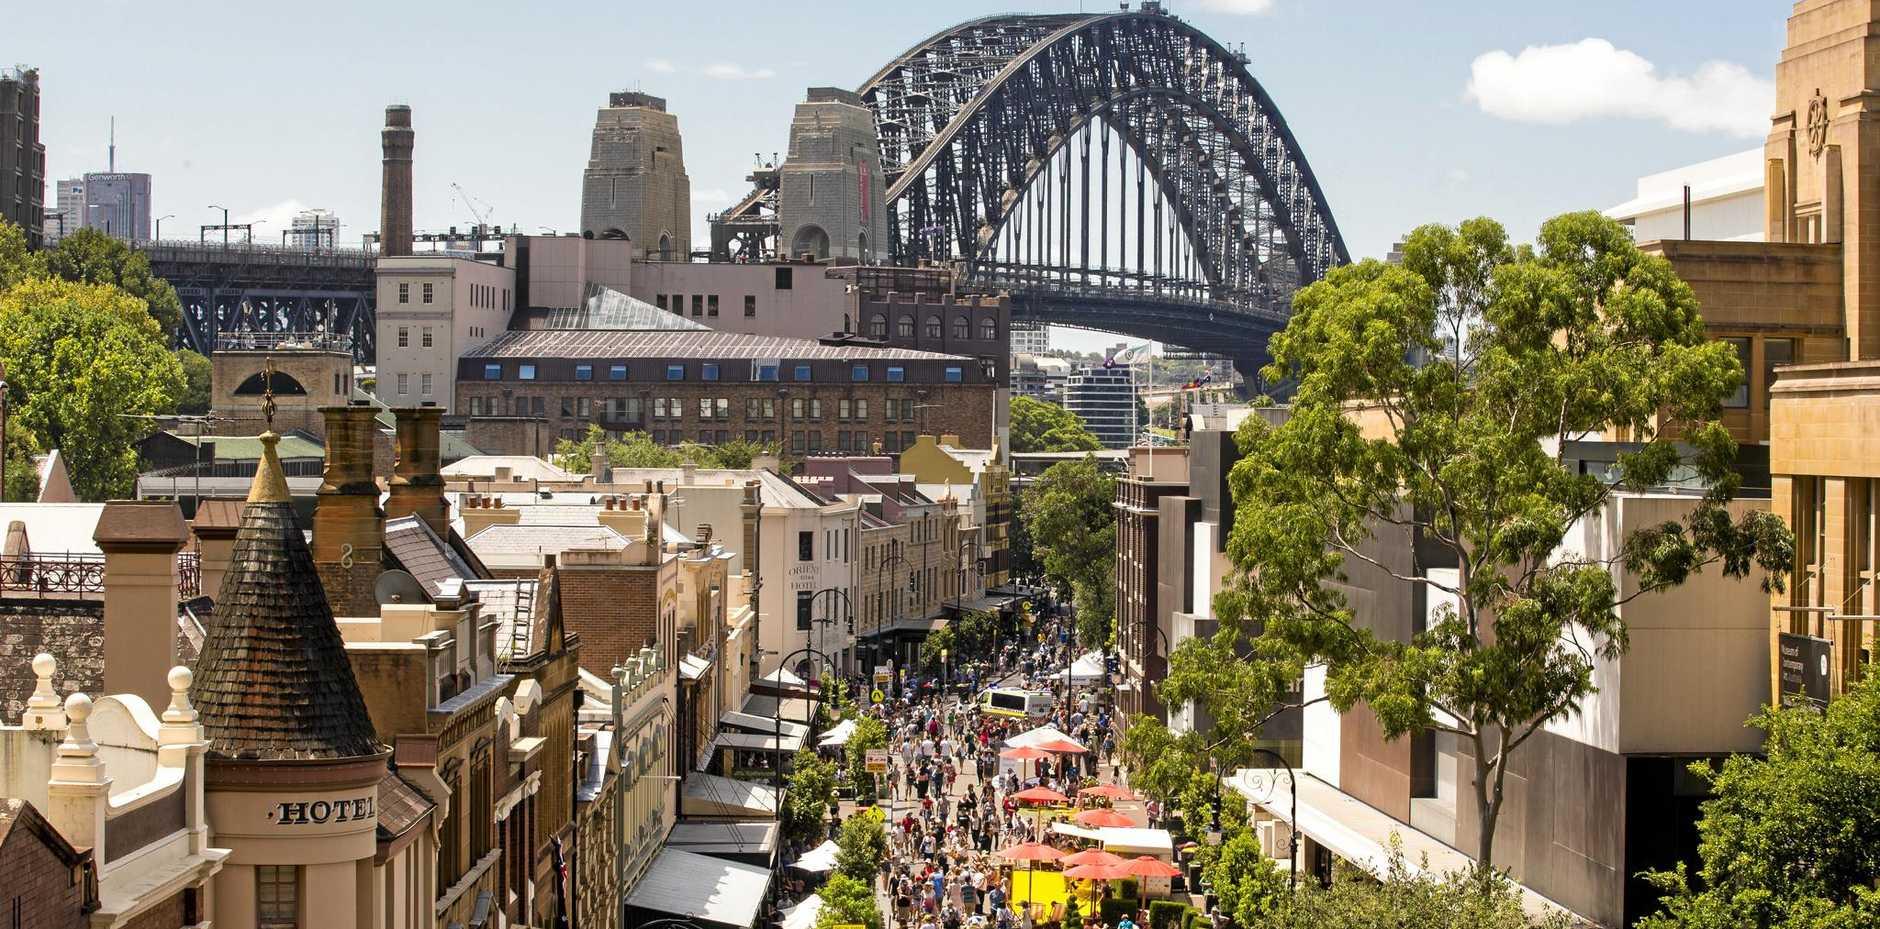 The Sydney Harbour Bridge.